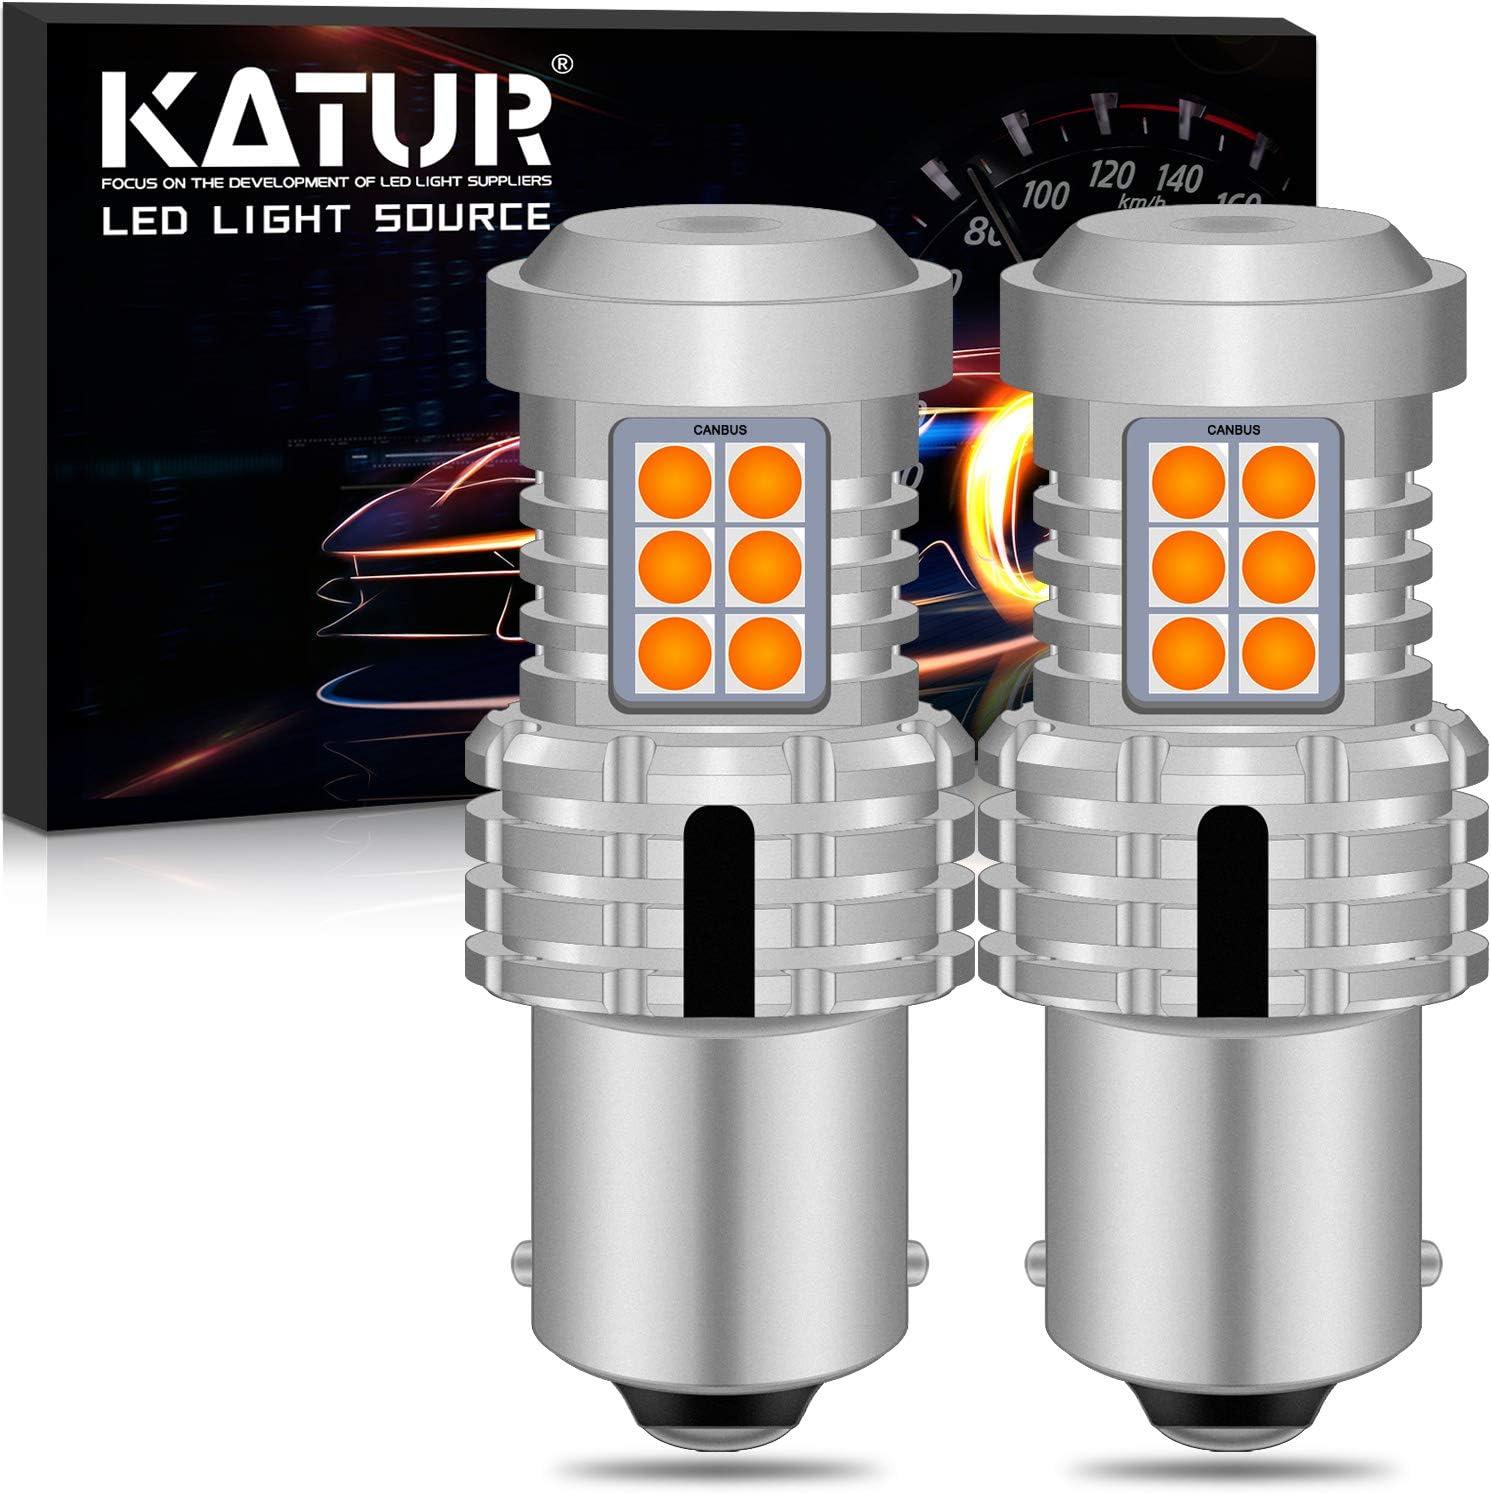 KATUR 1156 BA15S P21W 7506 Bombillas LED Superbrillantes 12pcs 3030 y 8pcs 3020 Chips Canbus Error Señal de Giro Libre Freno Trasero Cola de estacionamiento Luces,Ámbar Amarillo(Paquete de 2)